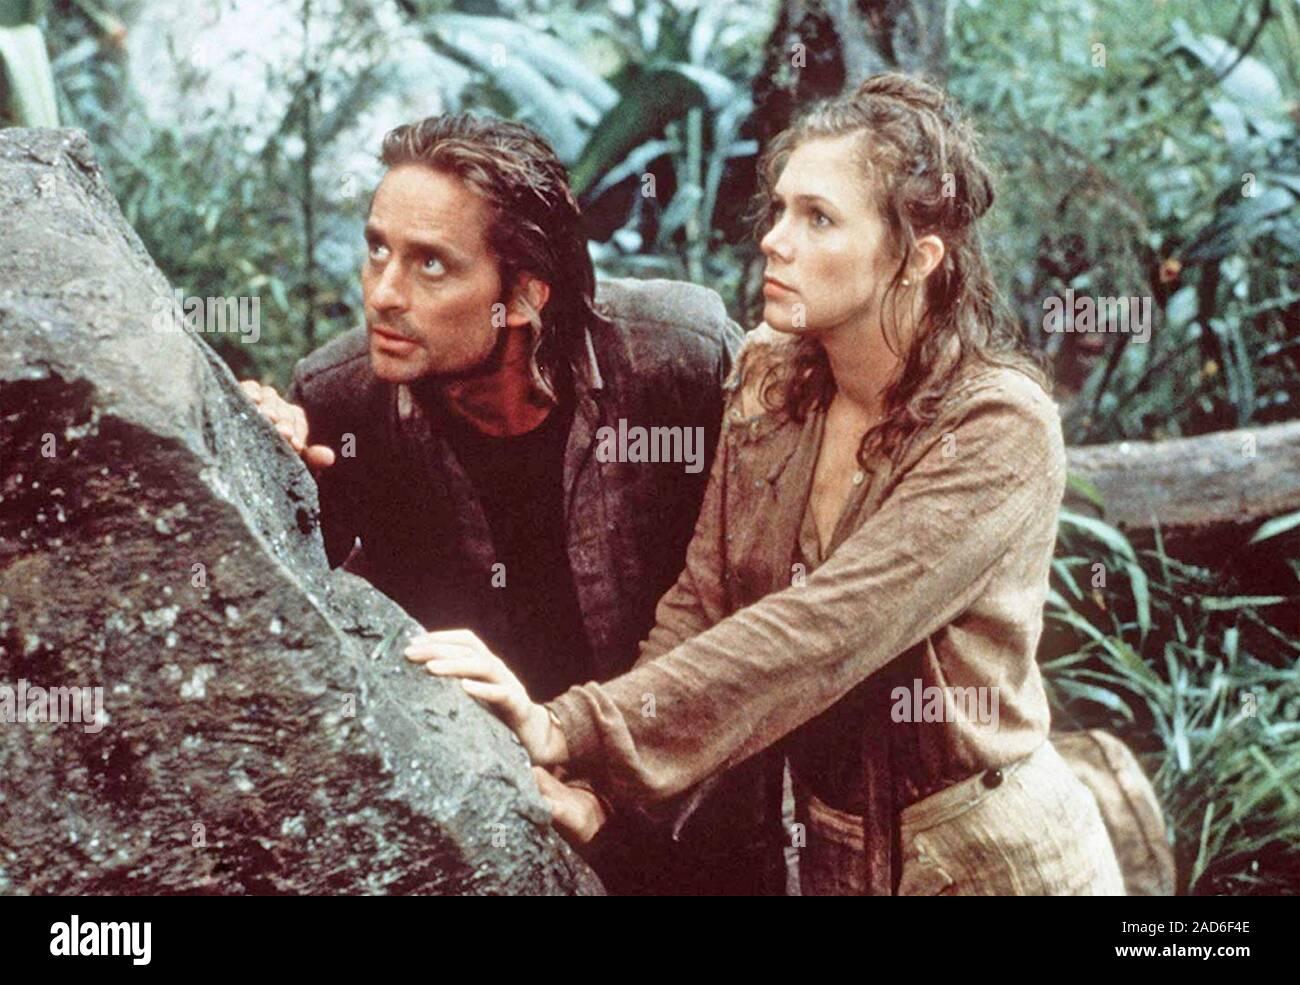 ROMANCING THE STONE 1984 20th Century Fox film with Michael Douglas and Kathleen Turner Stock Photo